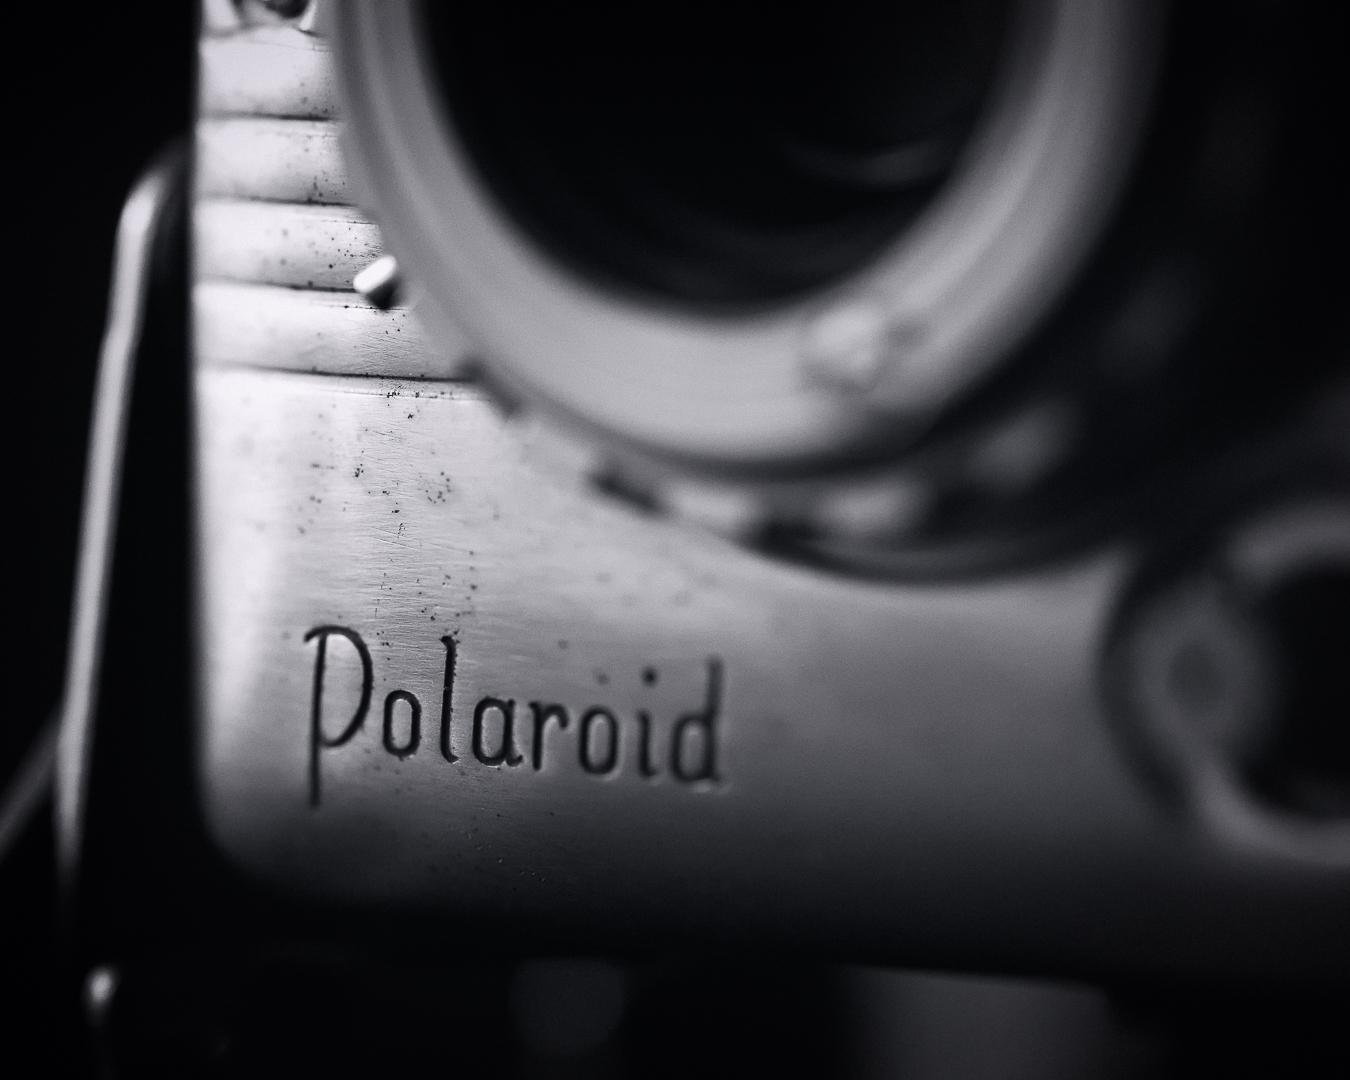 Polaroid-0001-Brian Suman Photography.jpg